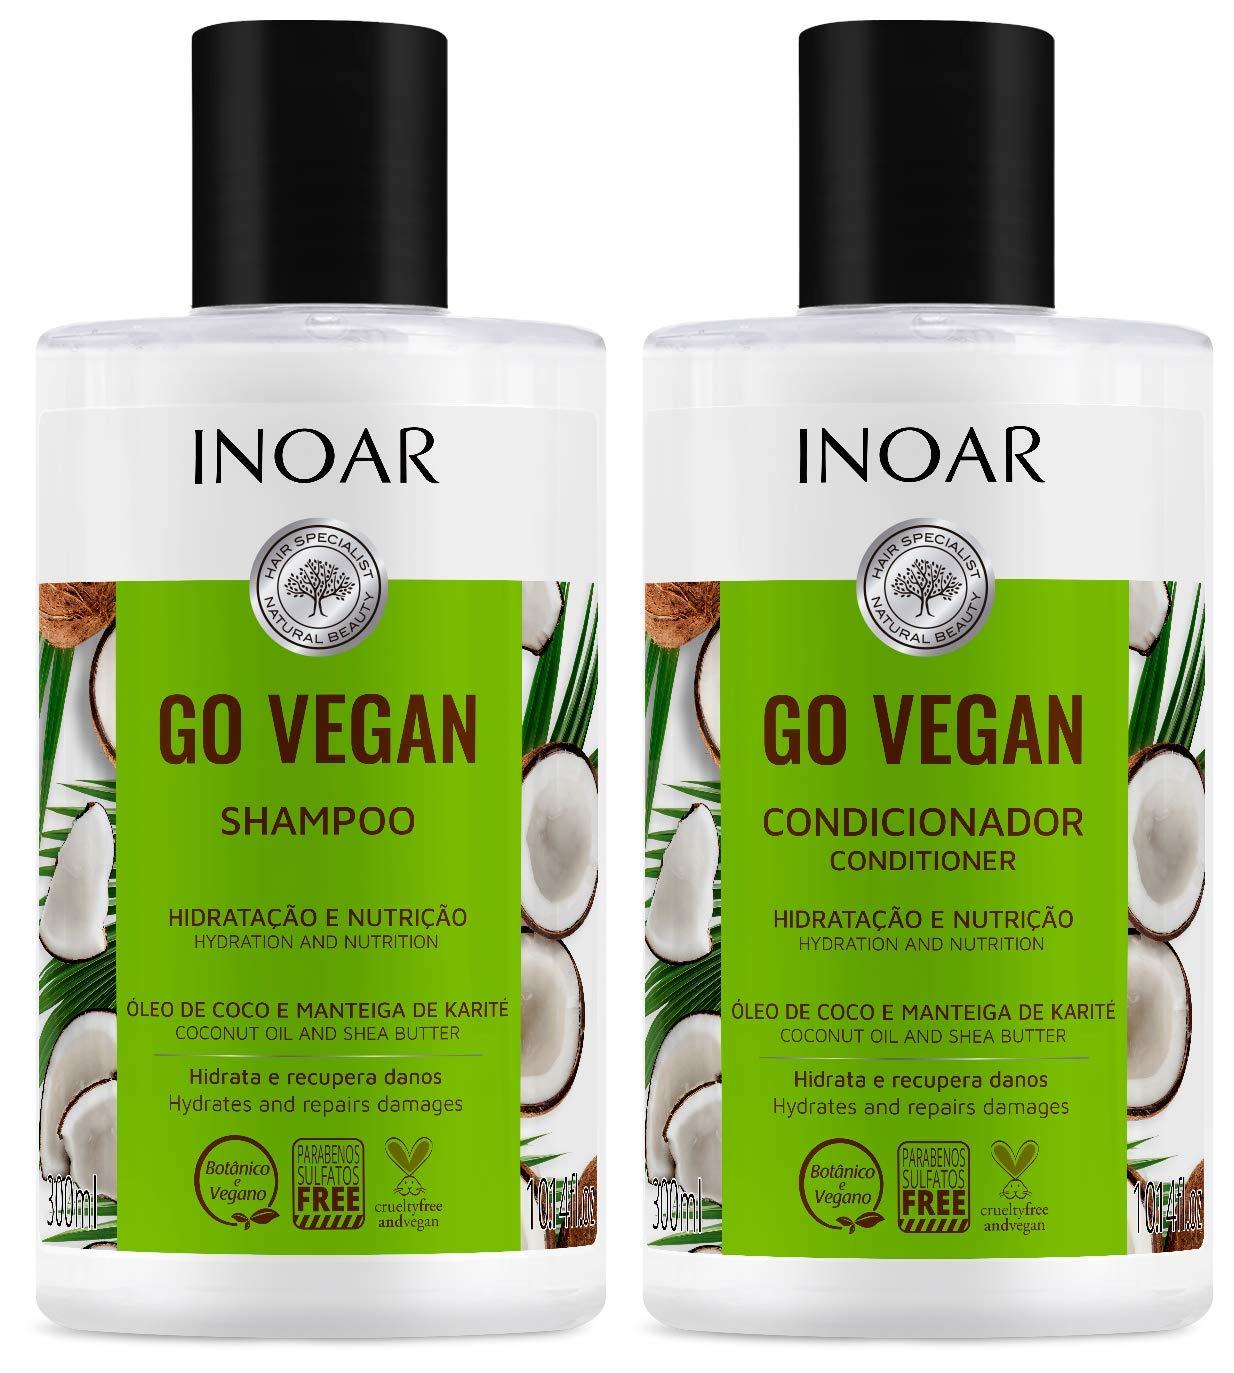 Topics on TV INOAR PROFESSIONAL - Go Vegan Shamp Hair and 1 year warranty Hydration Nutrition